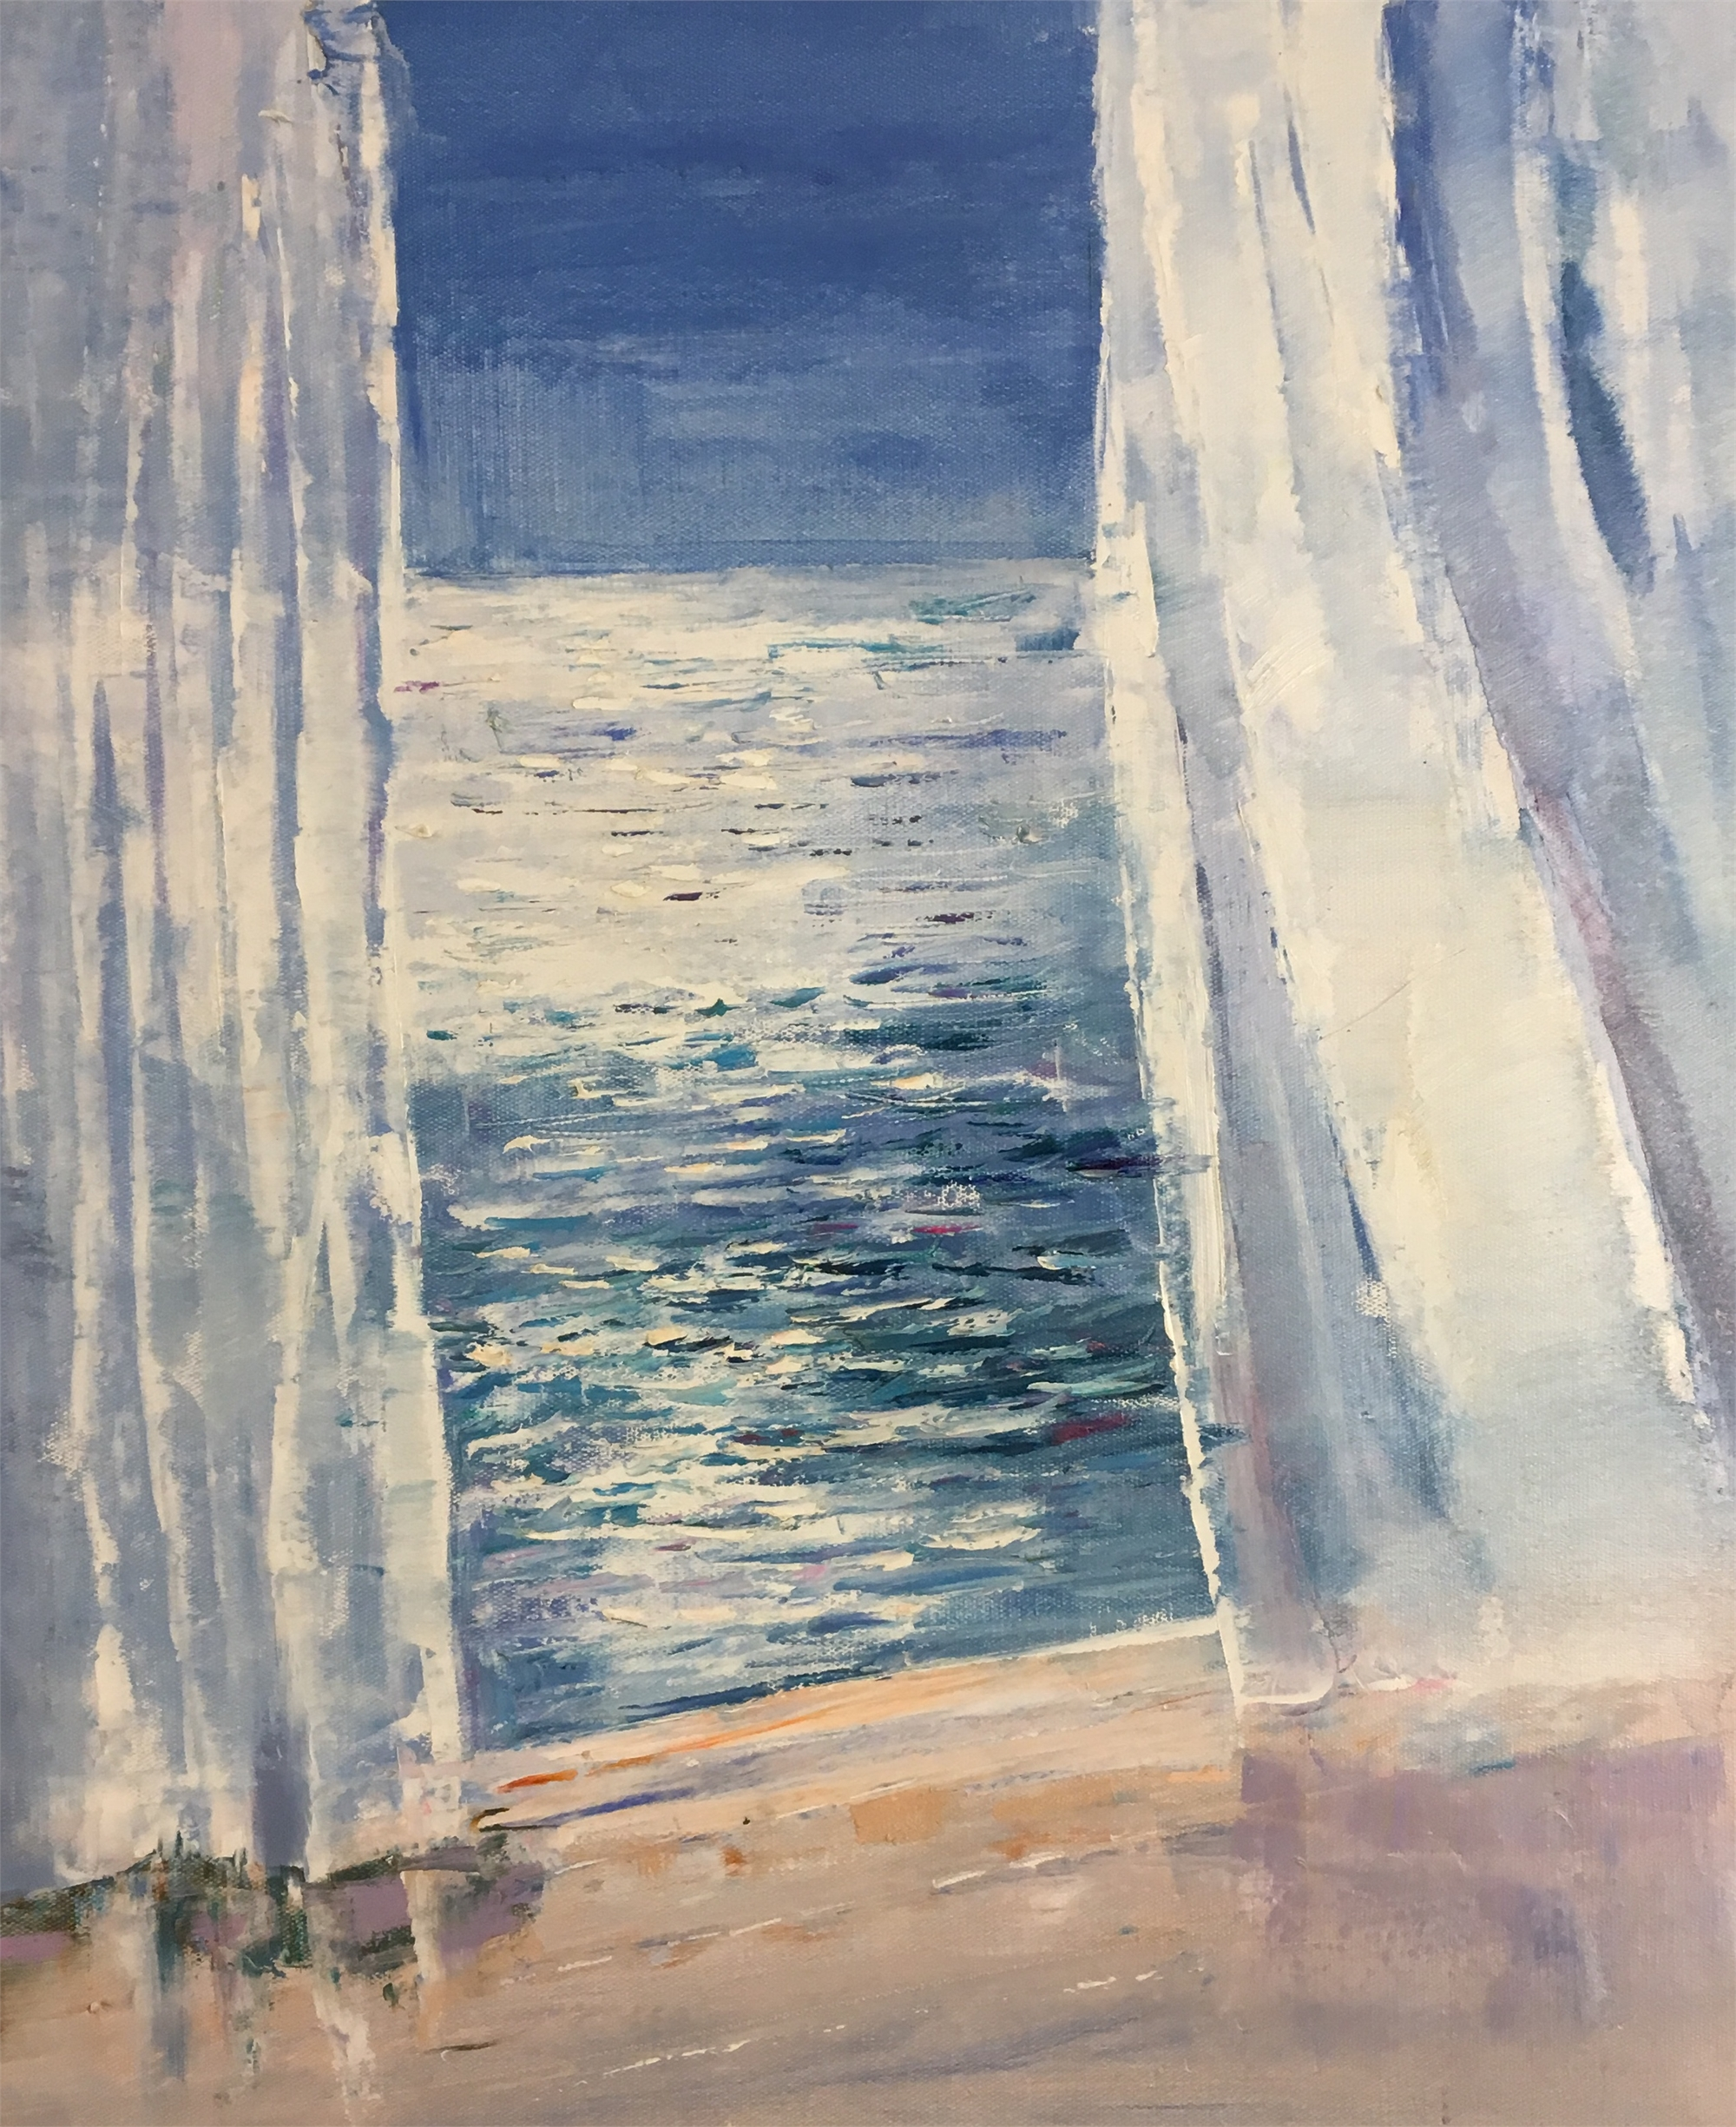 OCEAN VIEW THROUGH WINDOW by VARIOUS WORKS